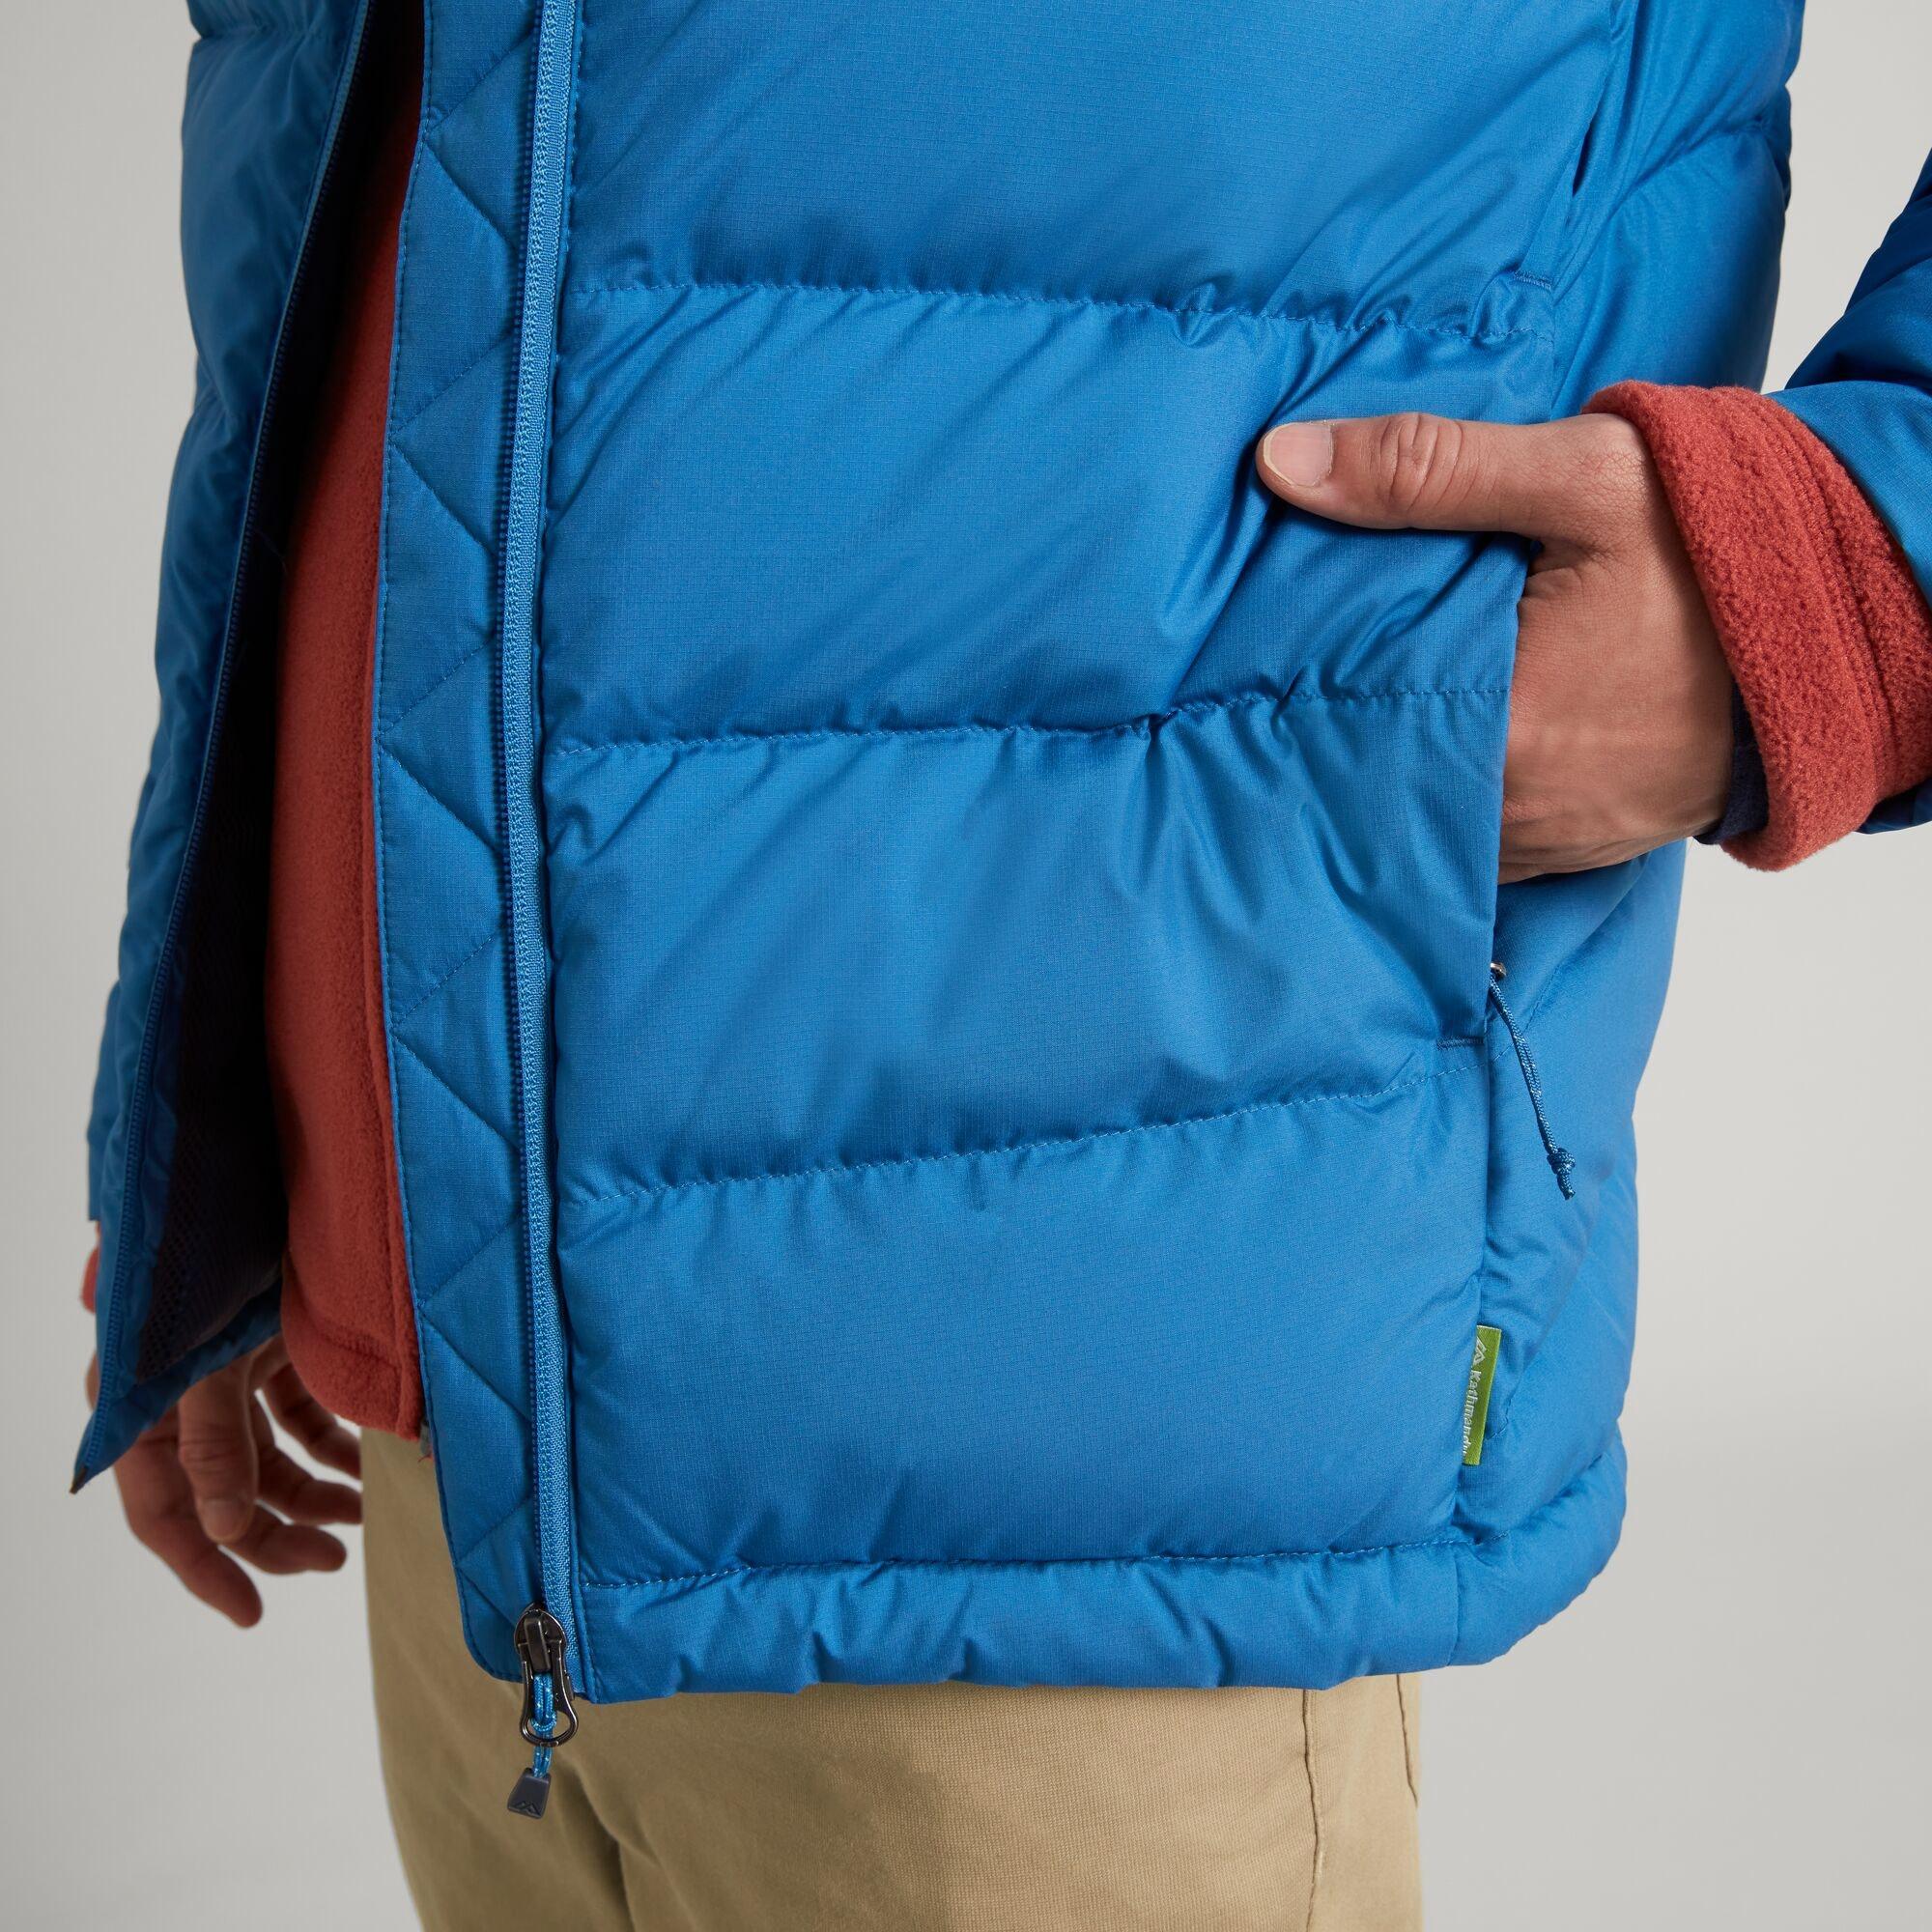 thumbnail 24 - NEW Kathmandu Epiq Mens 600 Fill Down Puffer Warm Outdoor Winter Jacket